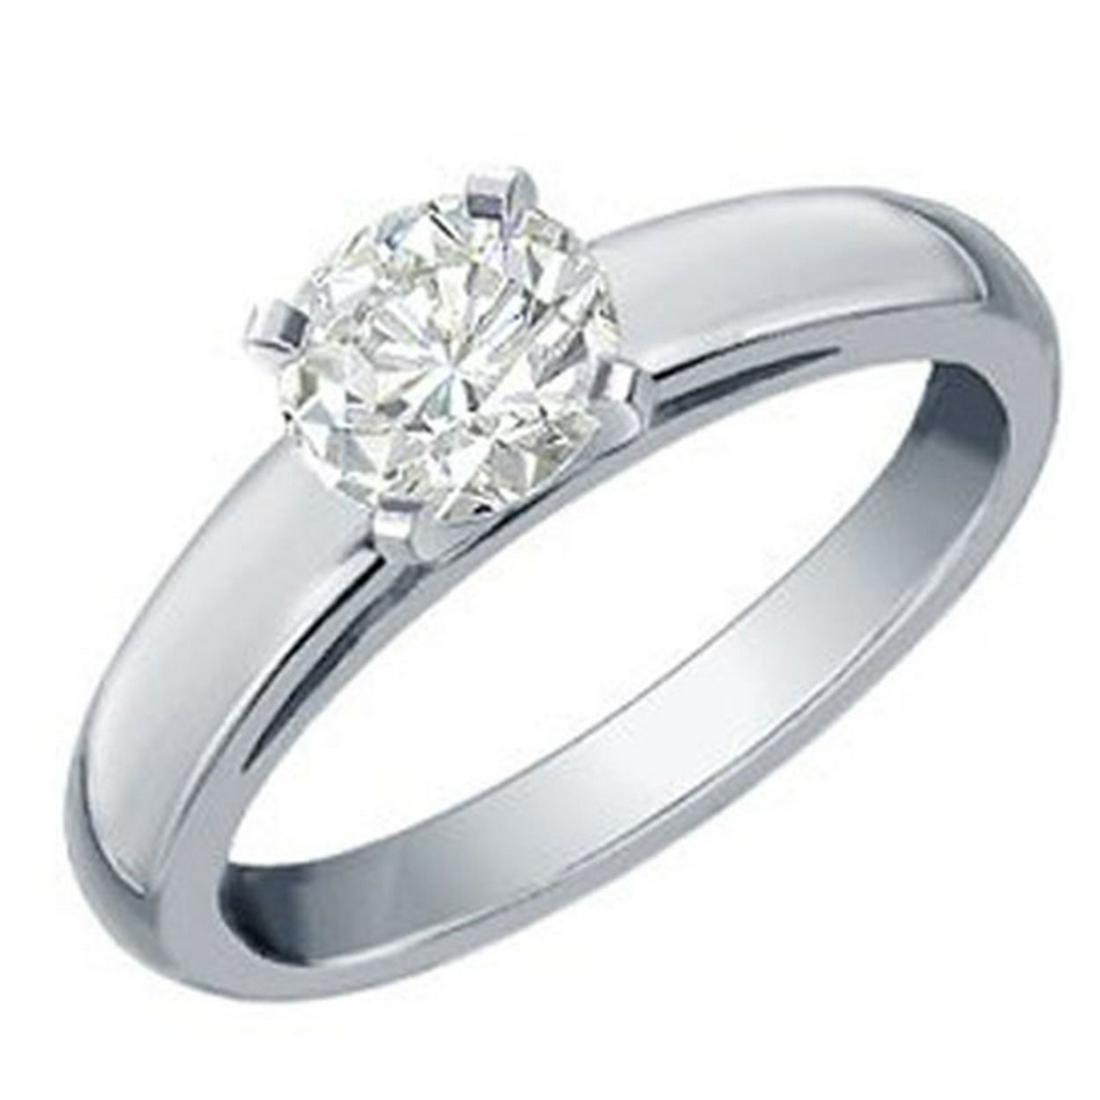 0.60 ctw VS/SI Diamond Solitaire Ring 18K White Gold